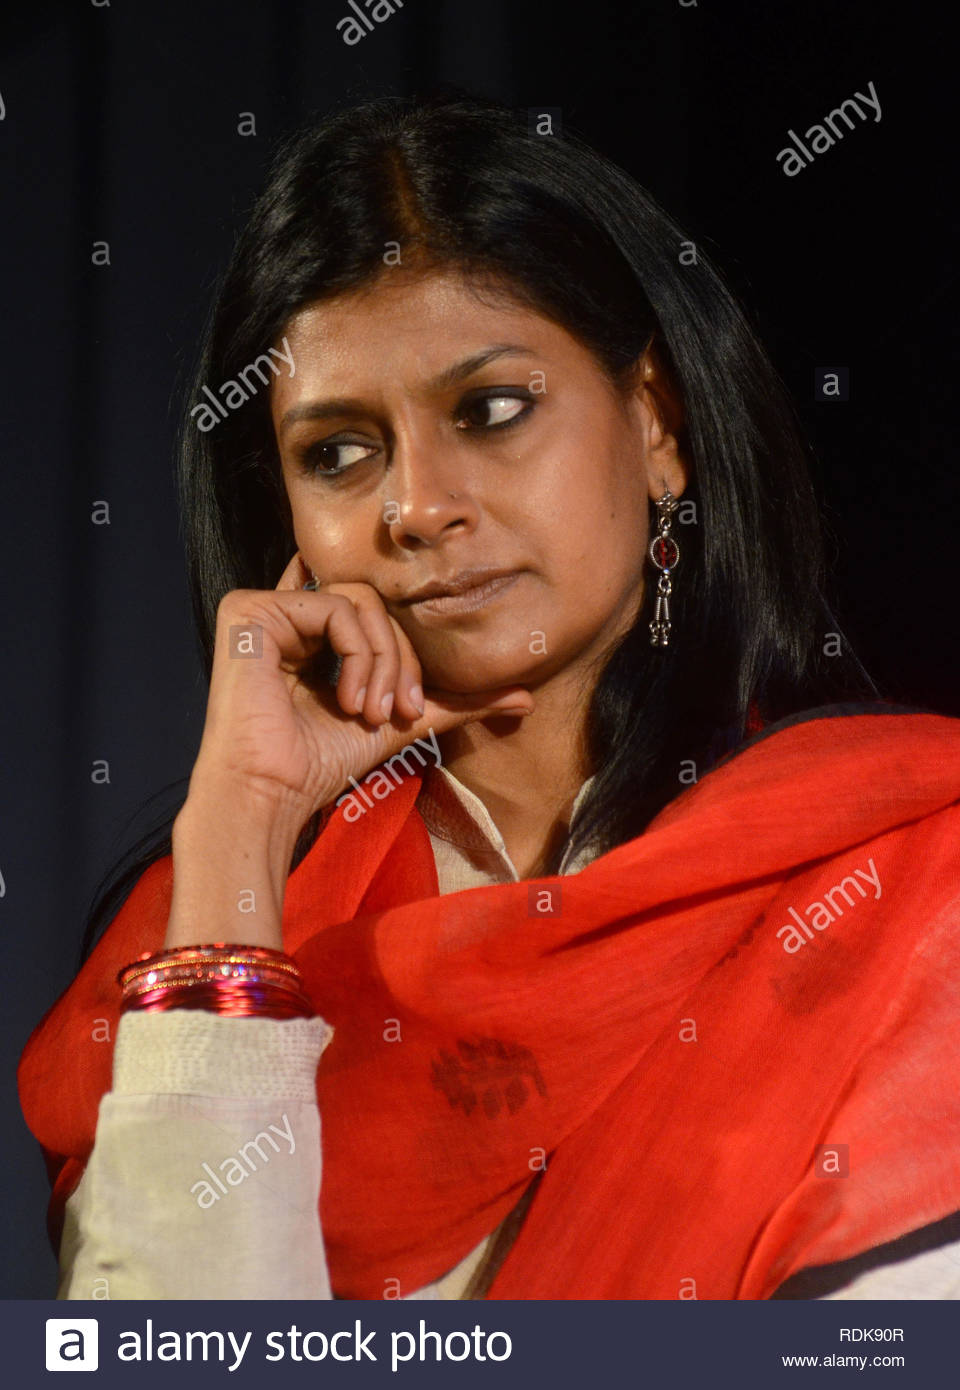 Nandita Das Stock Photos & Nandita Das Stock Images - Alamy